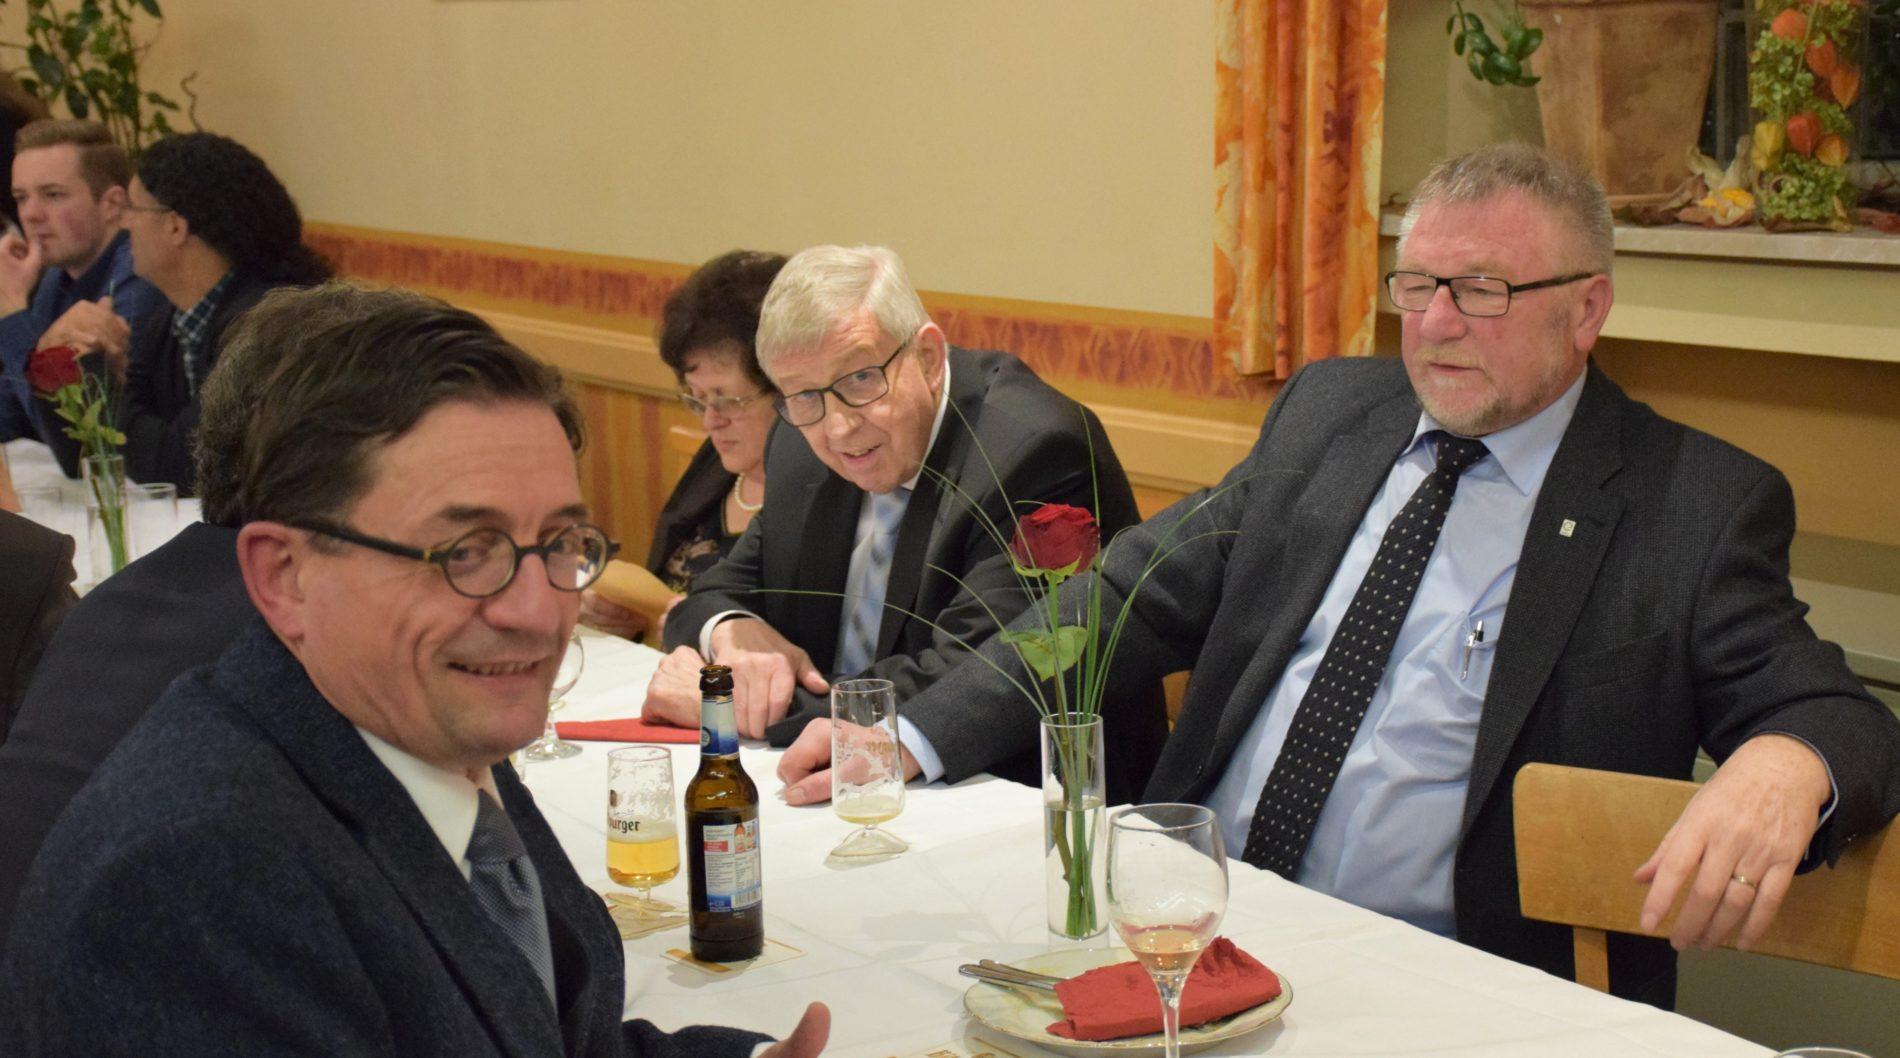 Carlo Sente, Heinz Junk und Paul Schaefer